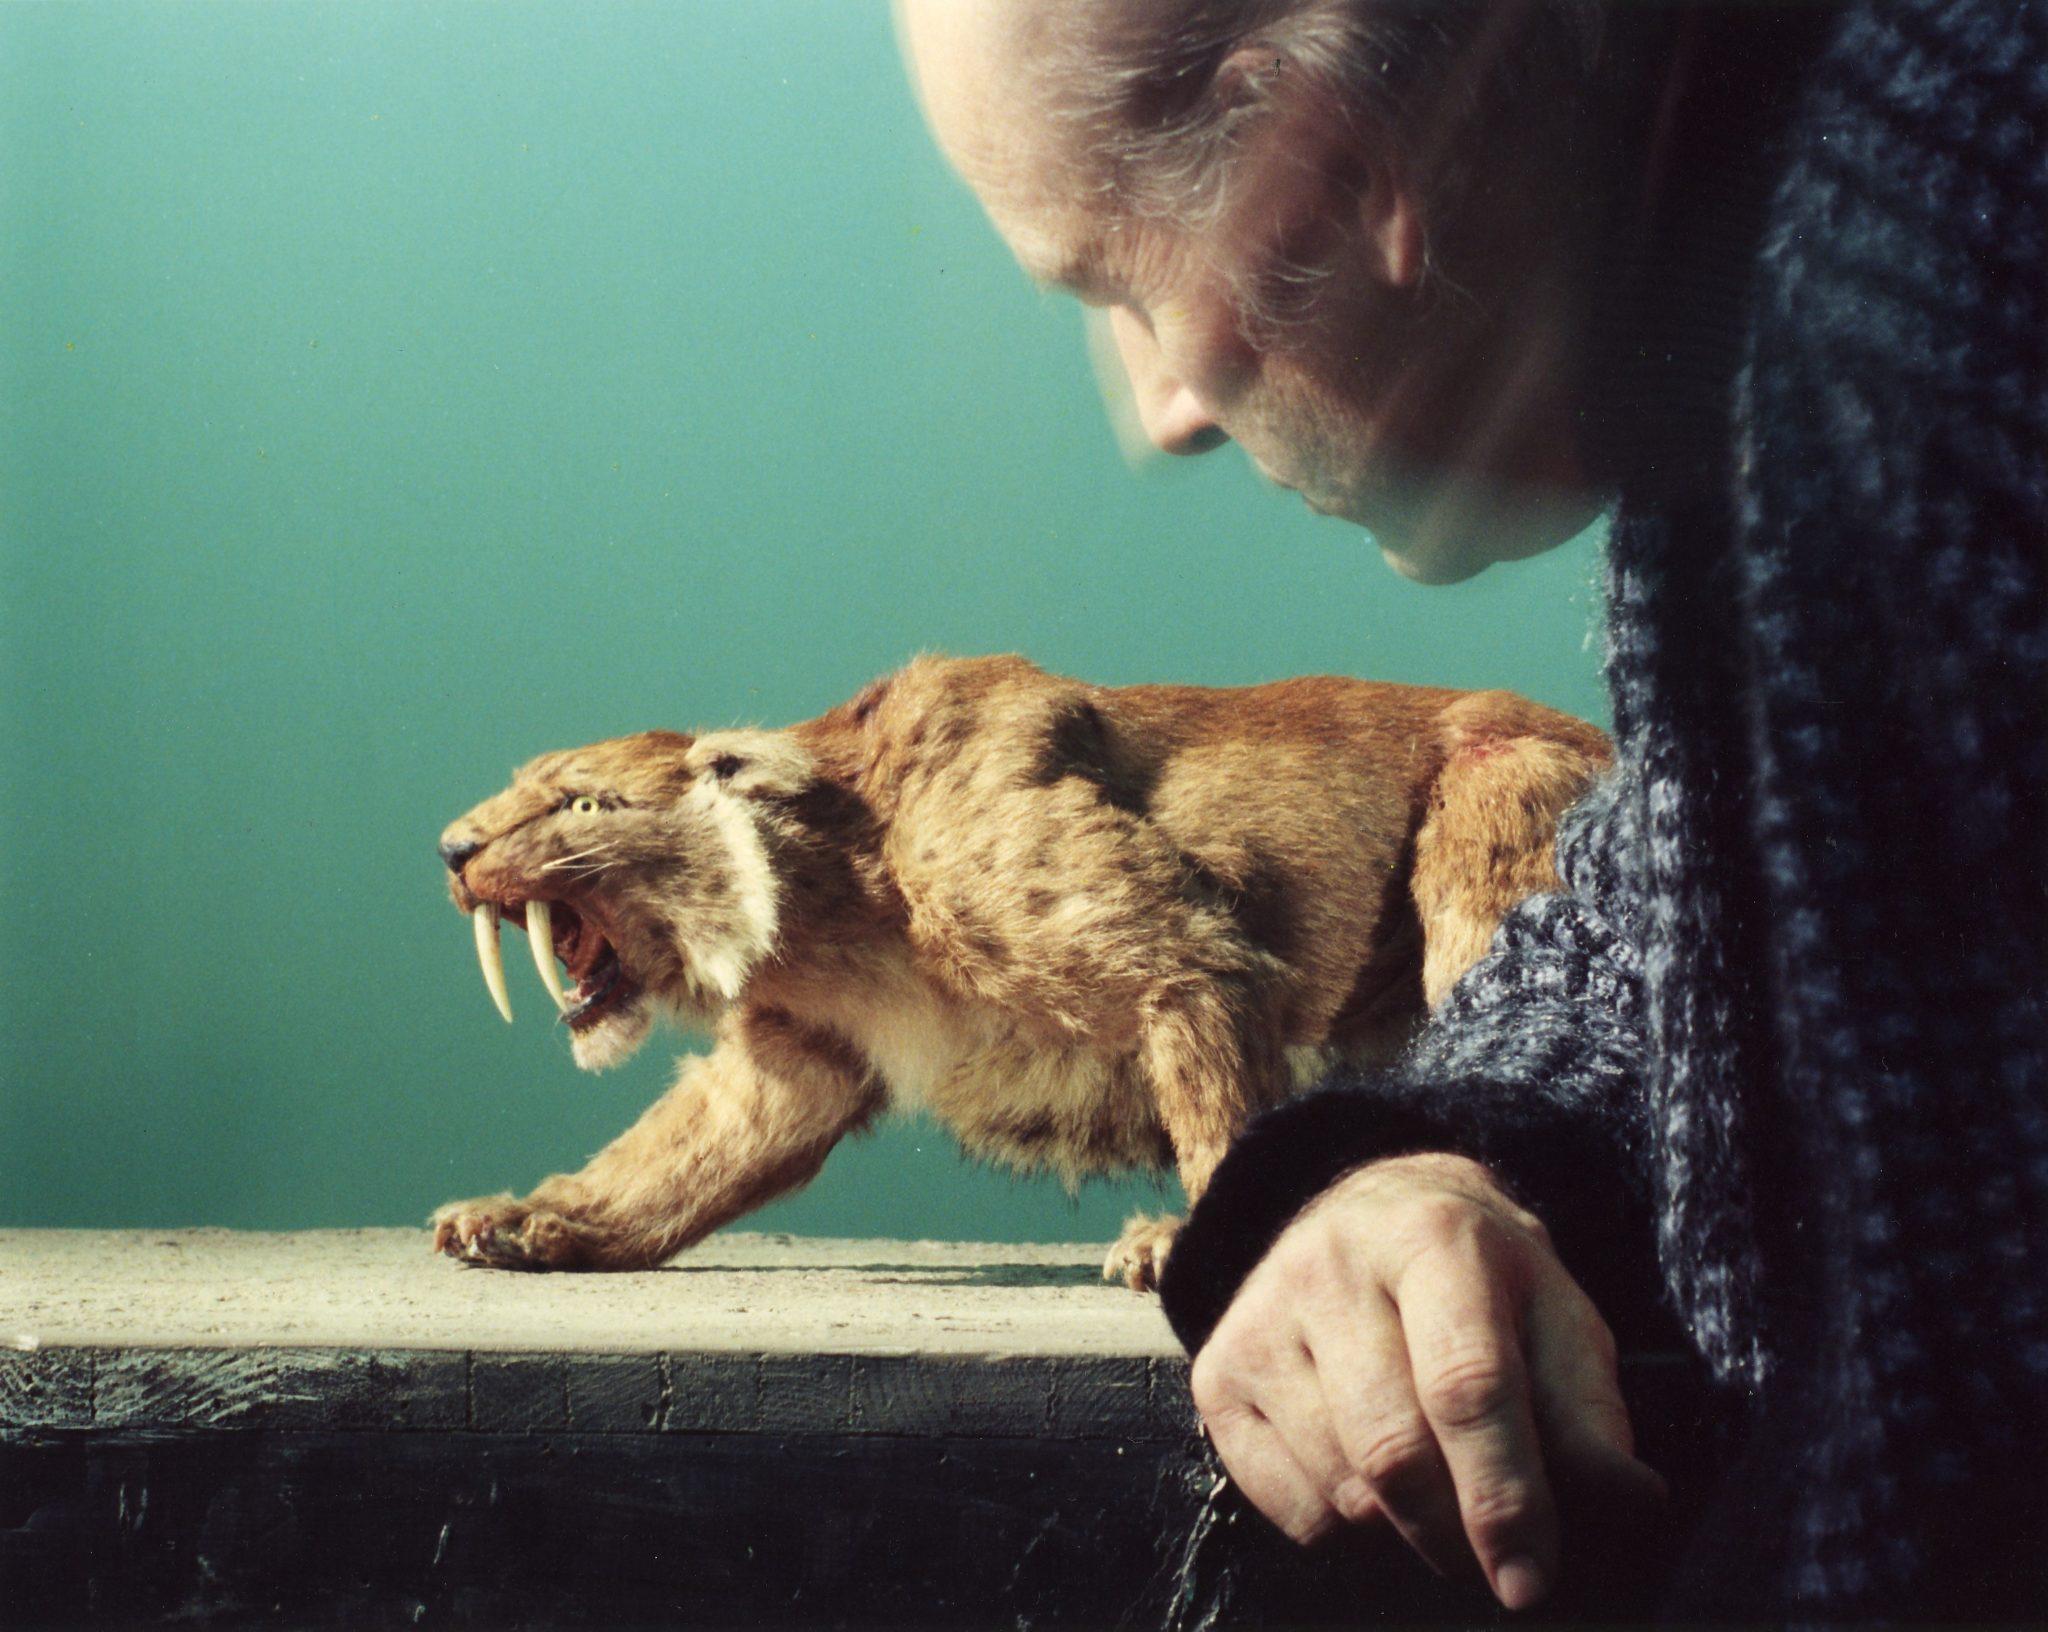 Ray Harryhausen Animating Tiger Ray Harryhausen 100 Years Exhibit at National Gallery of Scotland CMA